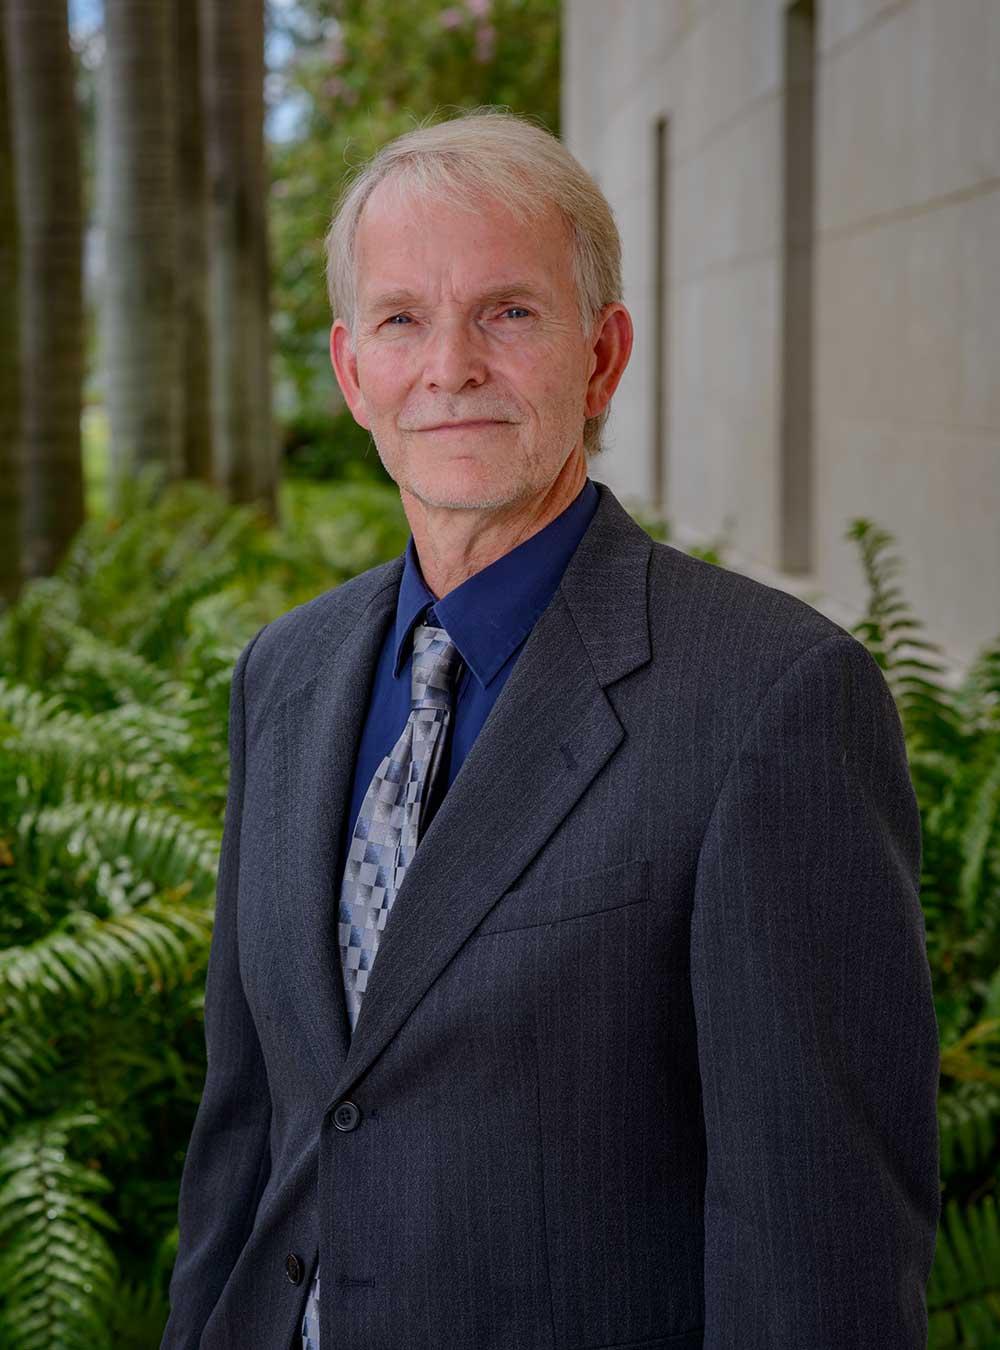 Portrait of David D. Walter